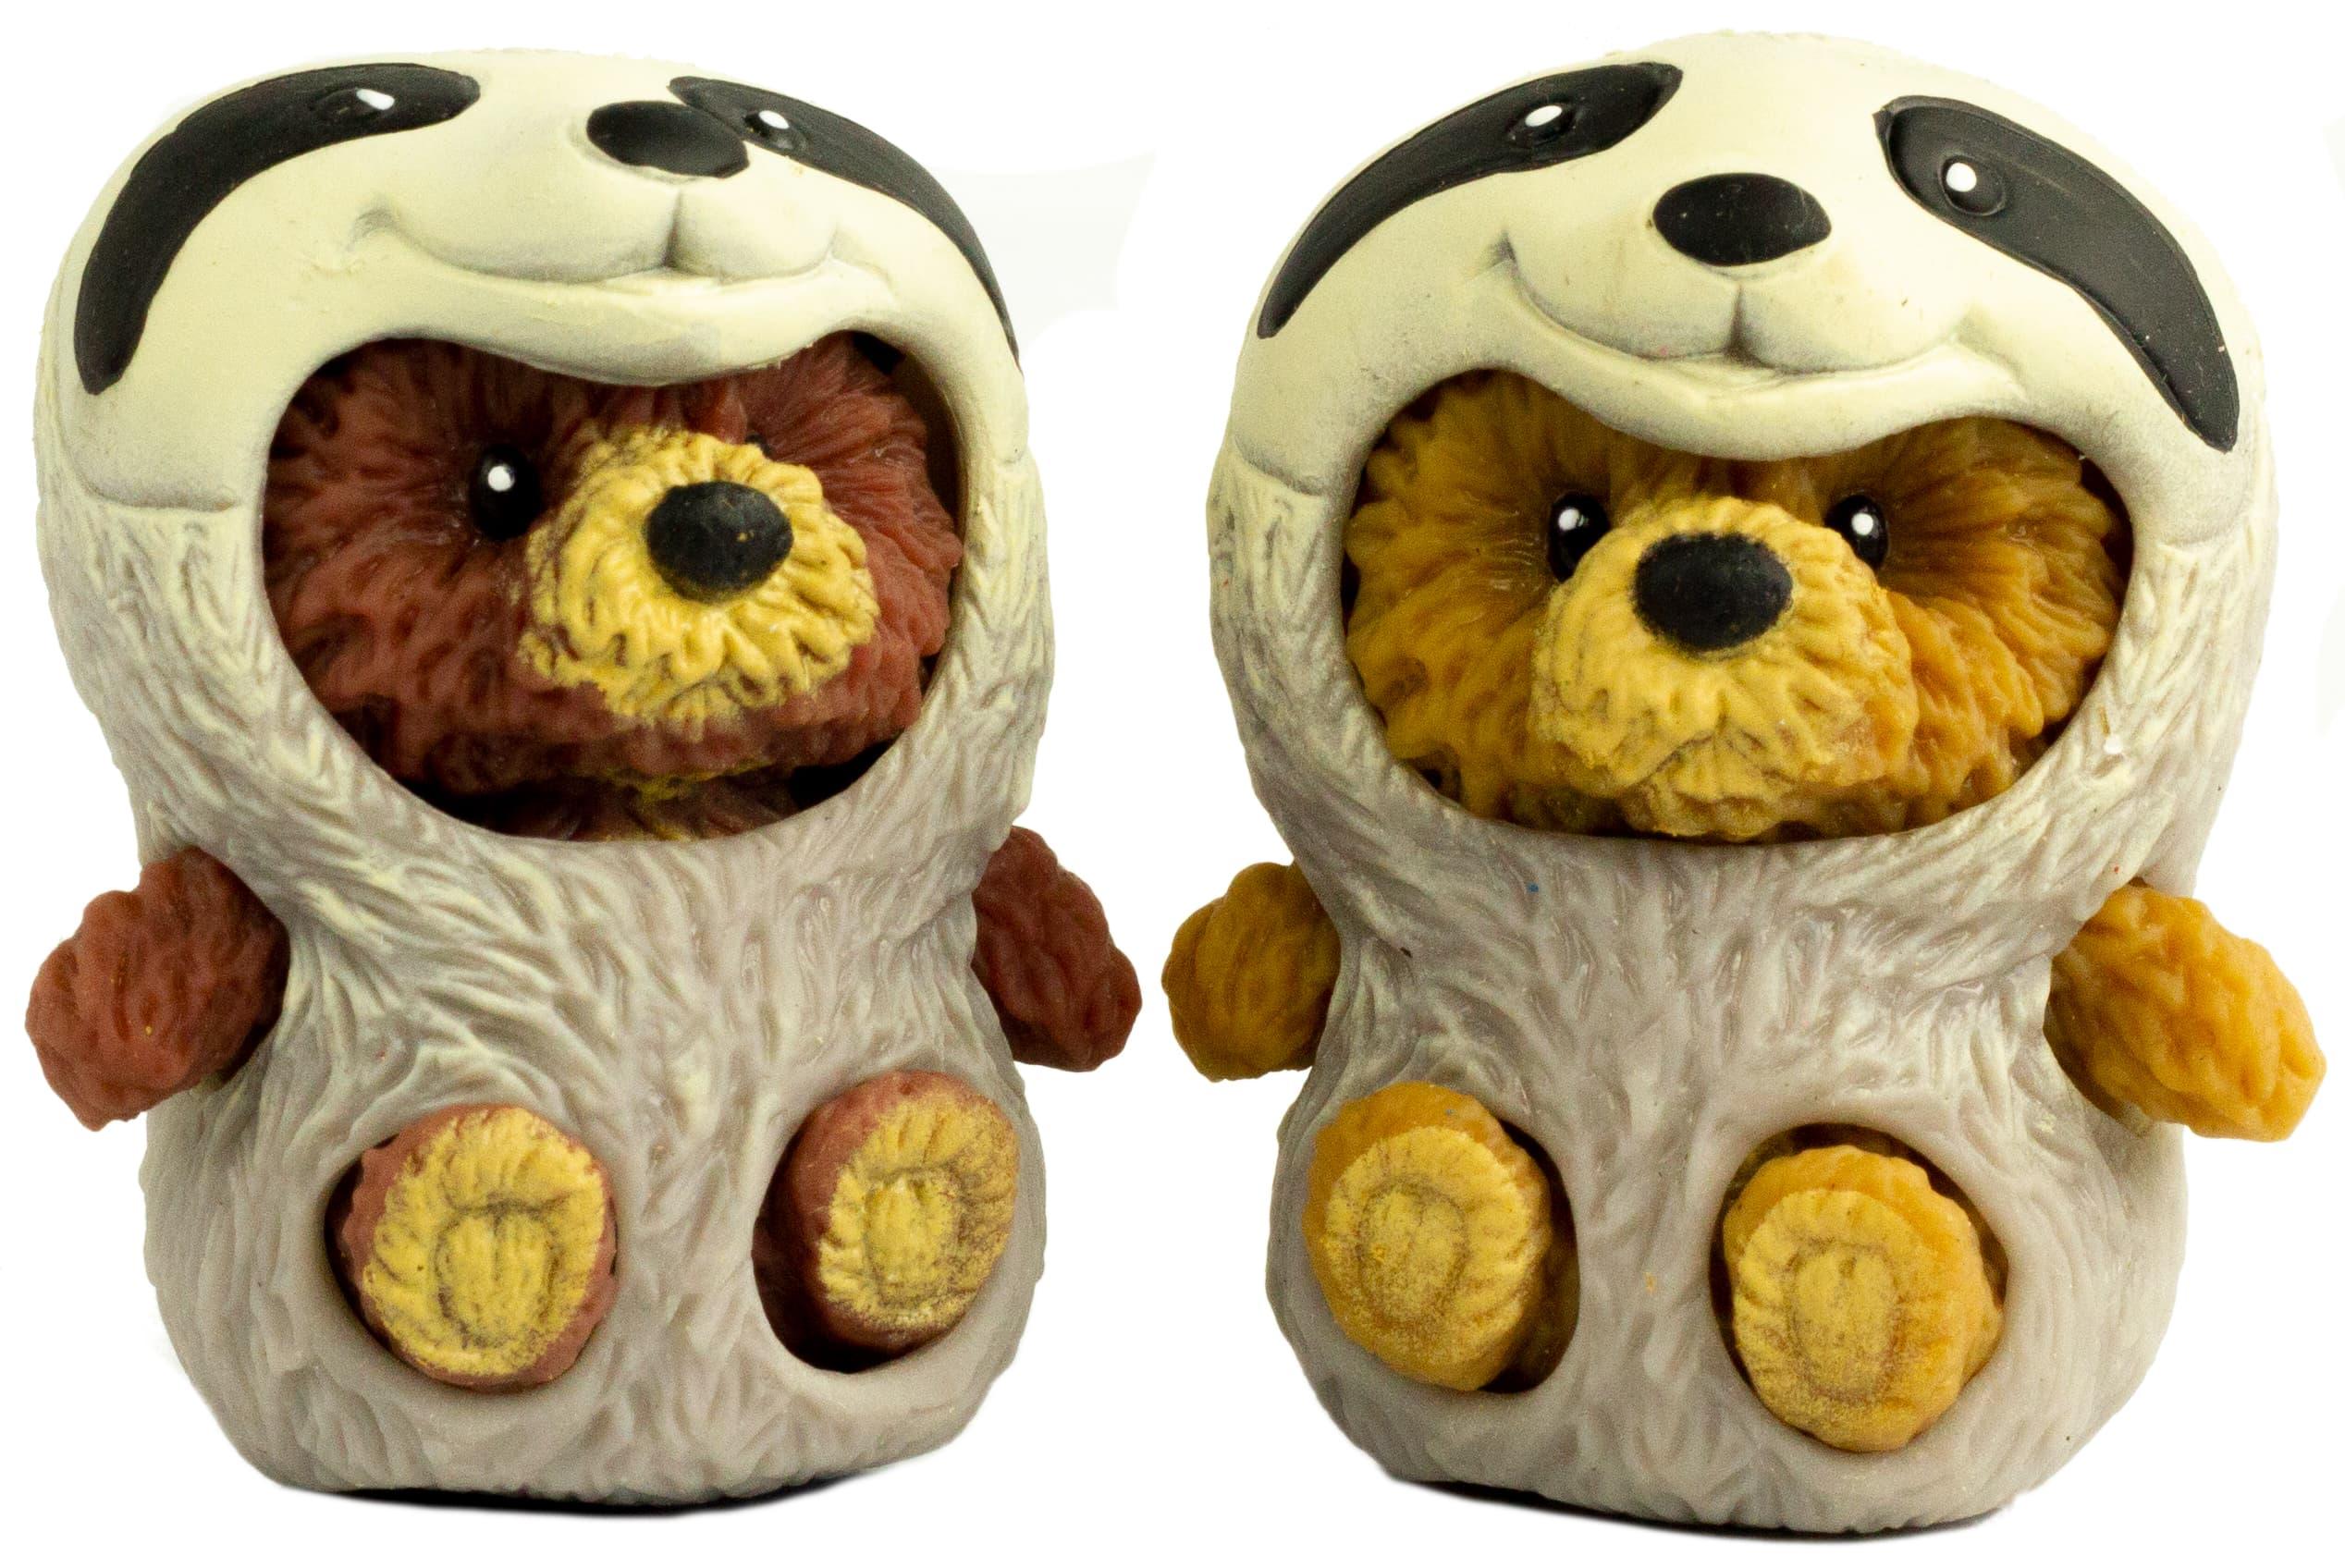 Фигурки-тянучки «Медвежата в костюмах Енота и Ежика» из термопластичной резины, 5 см., 2 шт. в пакете / A223B-DB